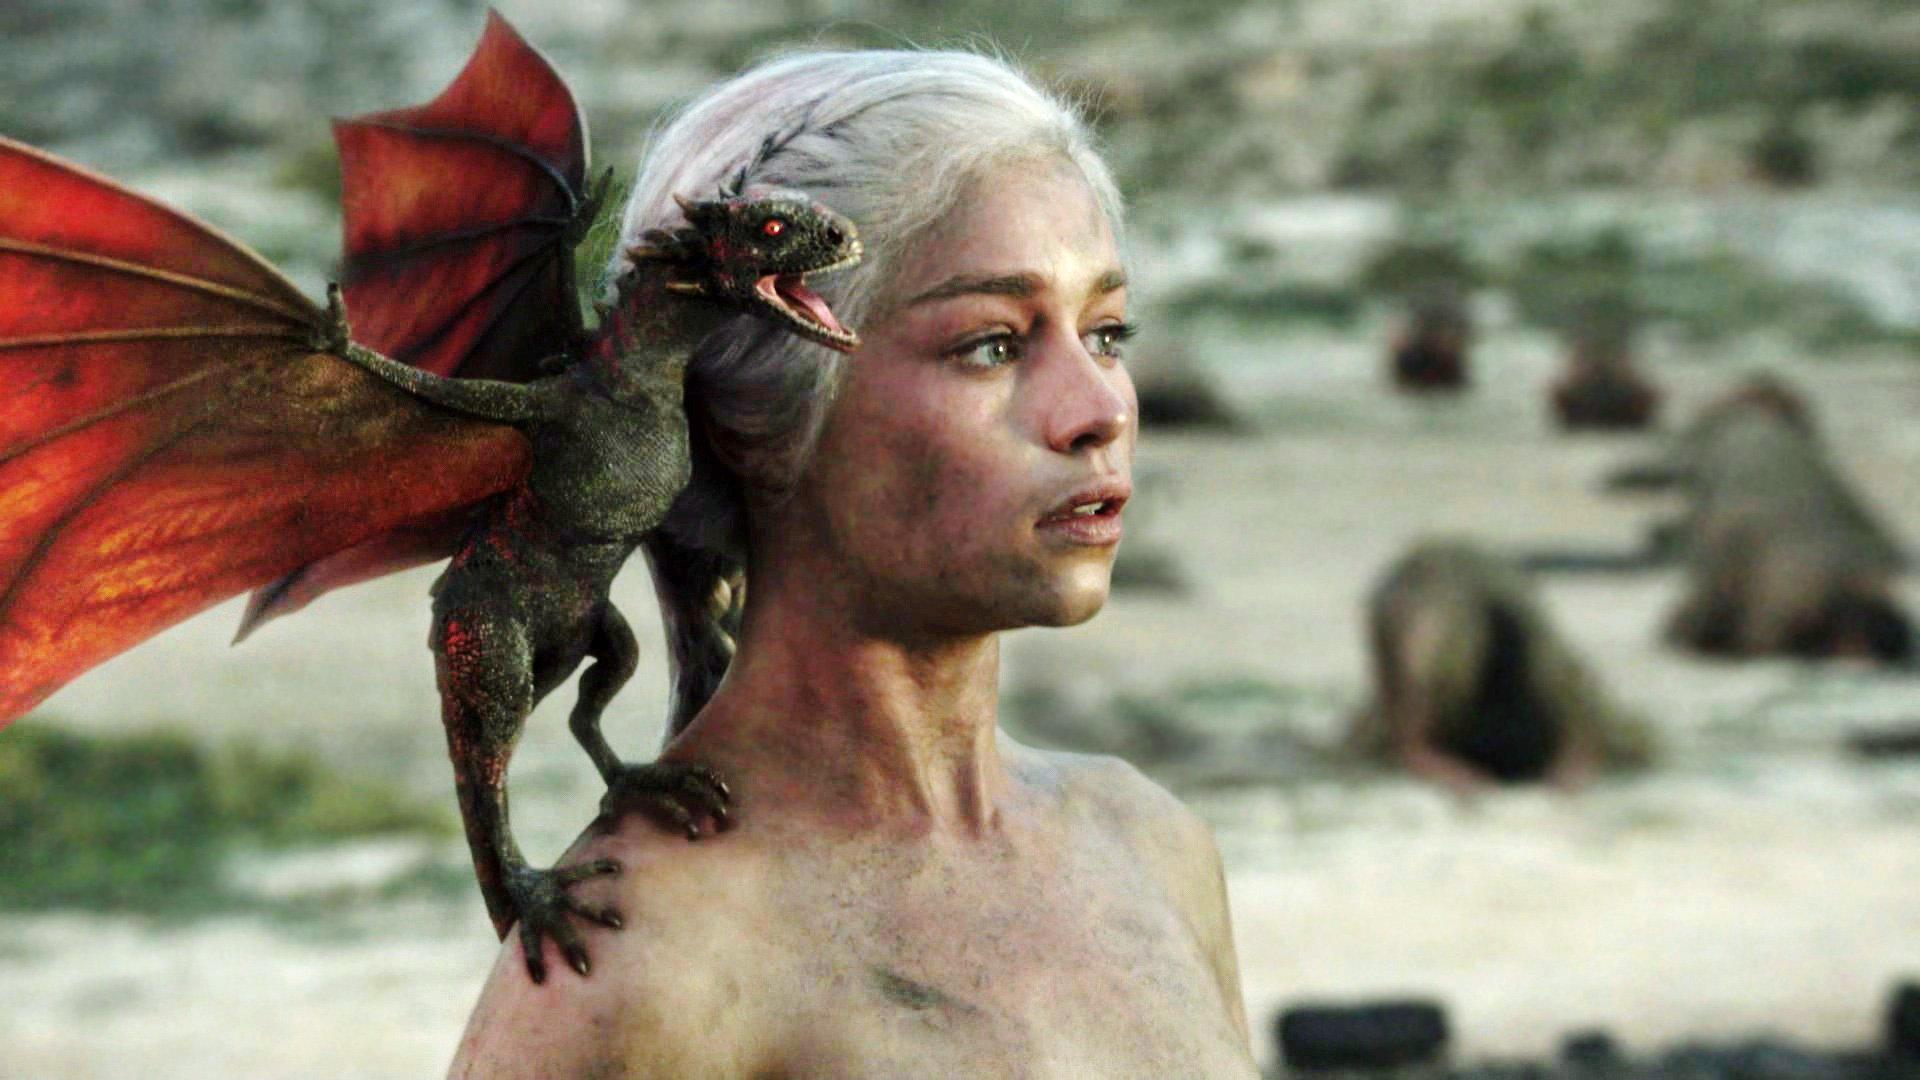 Daenerys with dragon